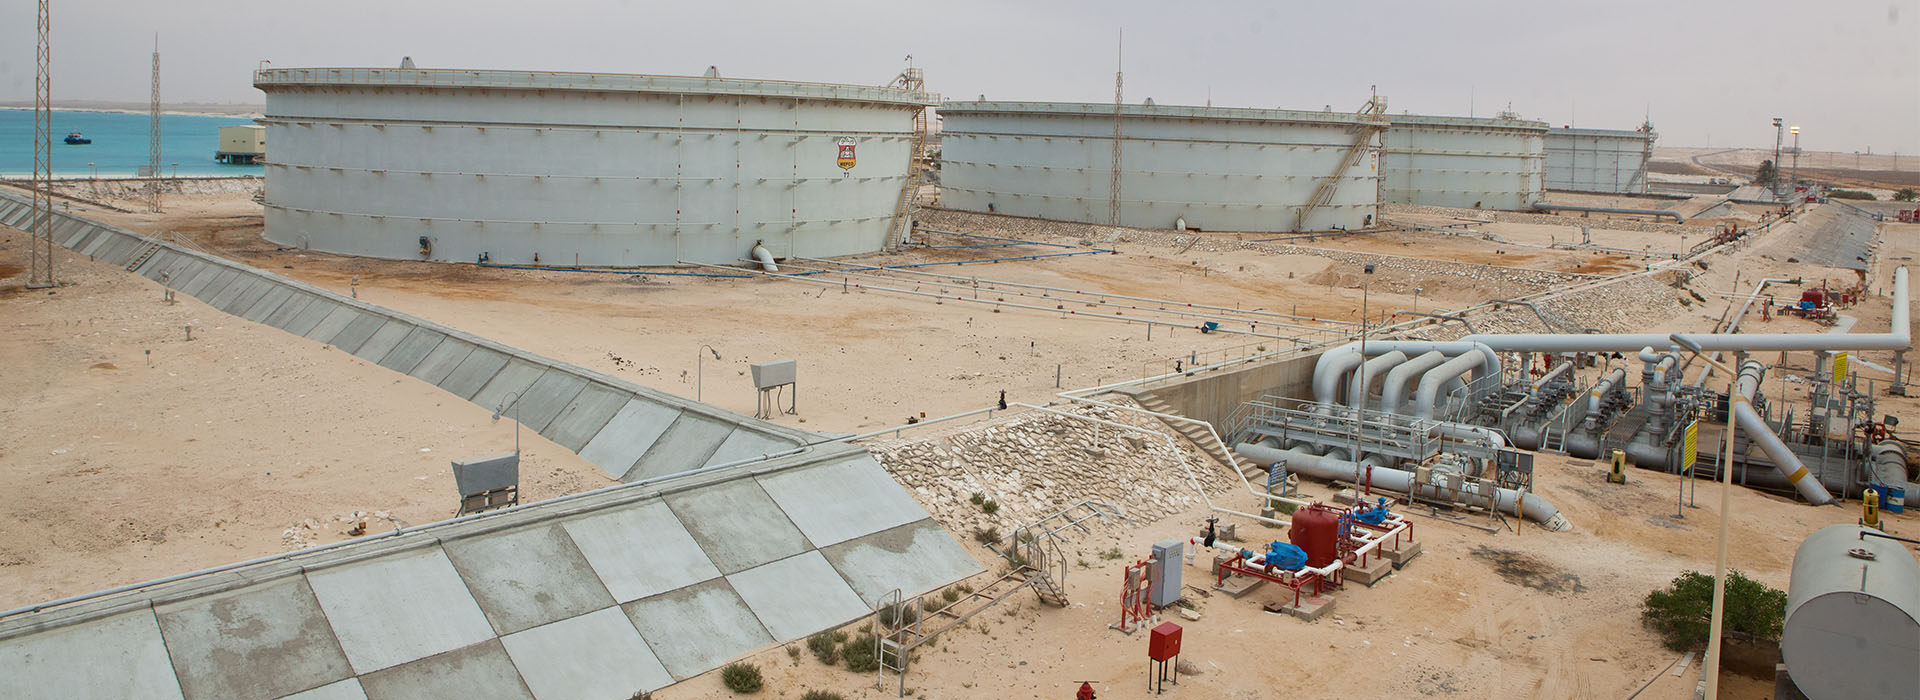 wepco egypt ميناء الحمراء